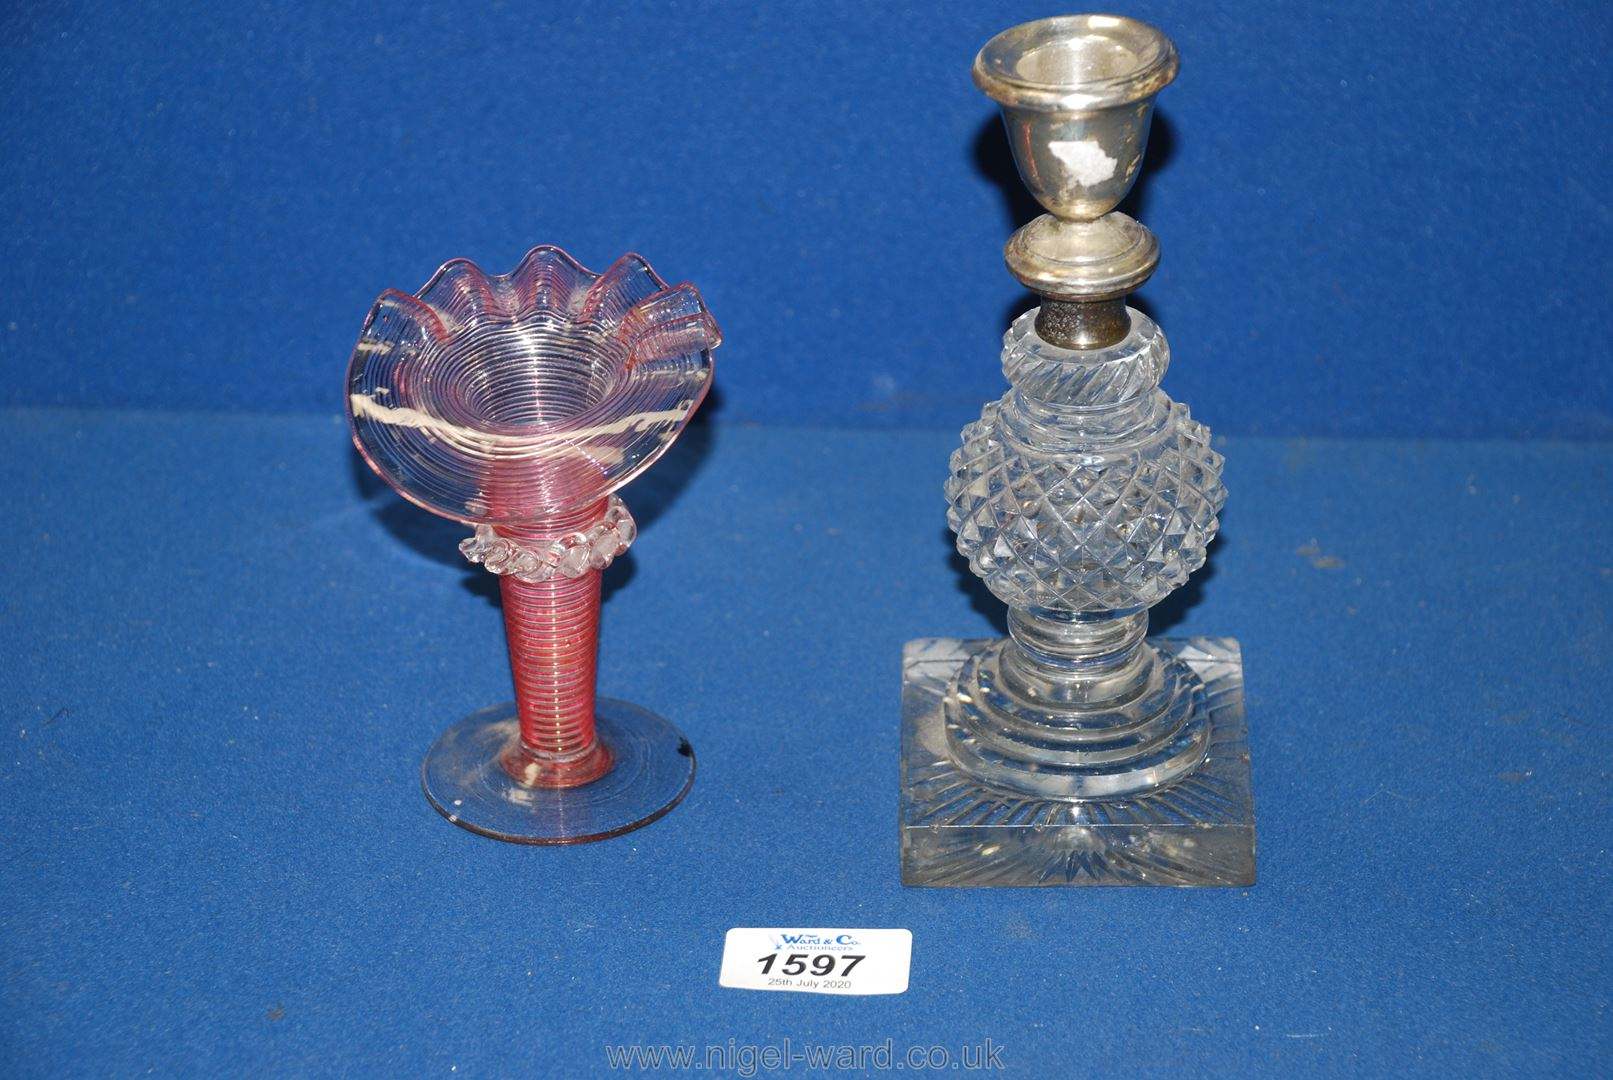 Lot 1597 - A cut glass Candlestick,